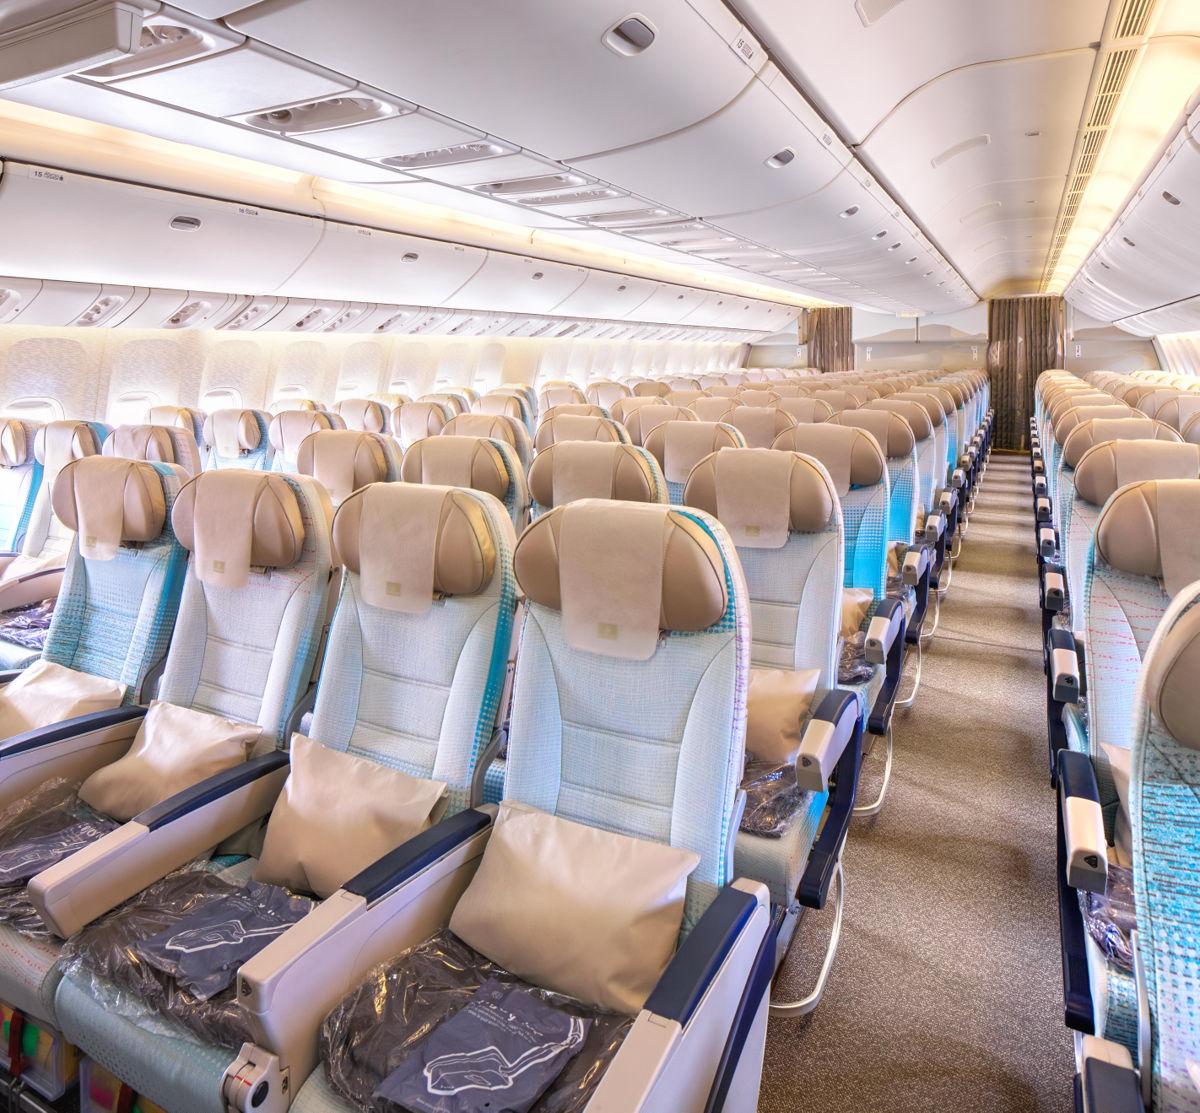 Emirates Boeing 777 200lr Economy Class 1 Insideflyer De